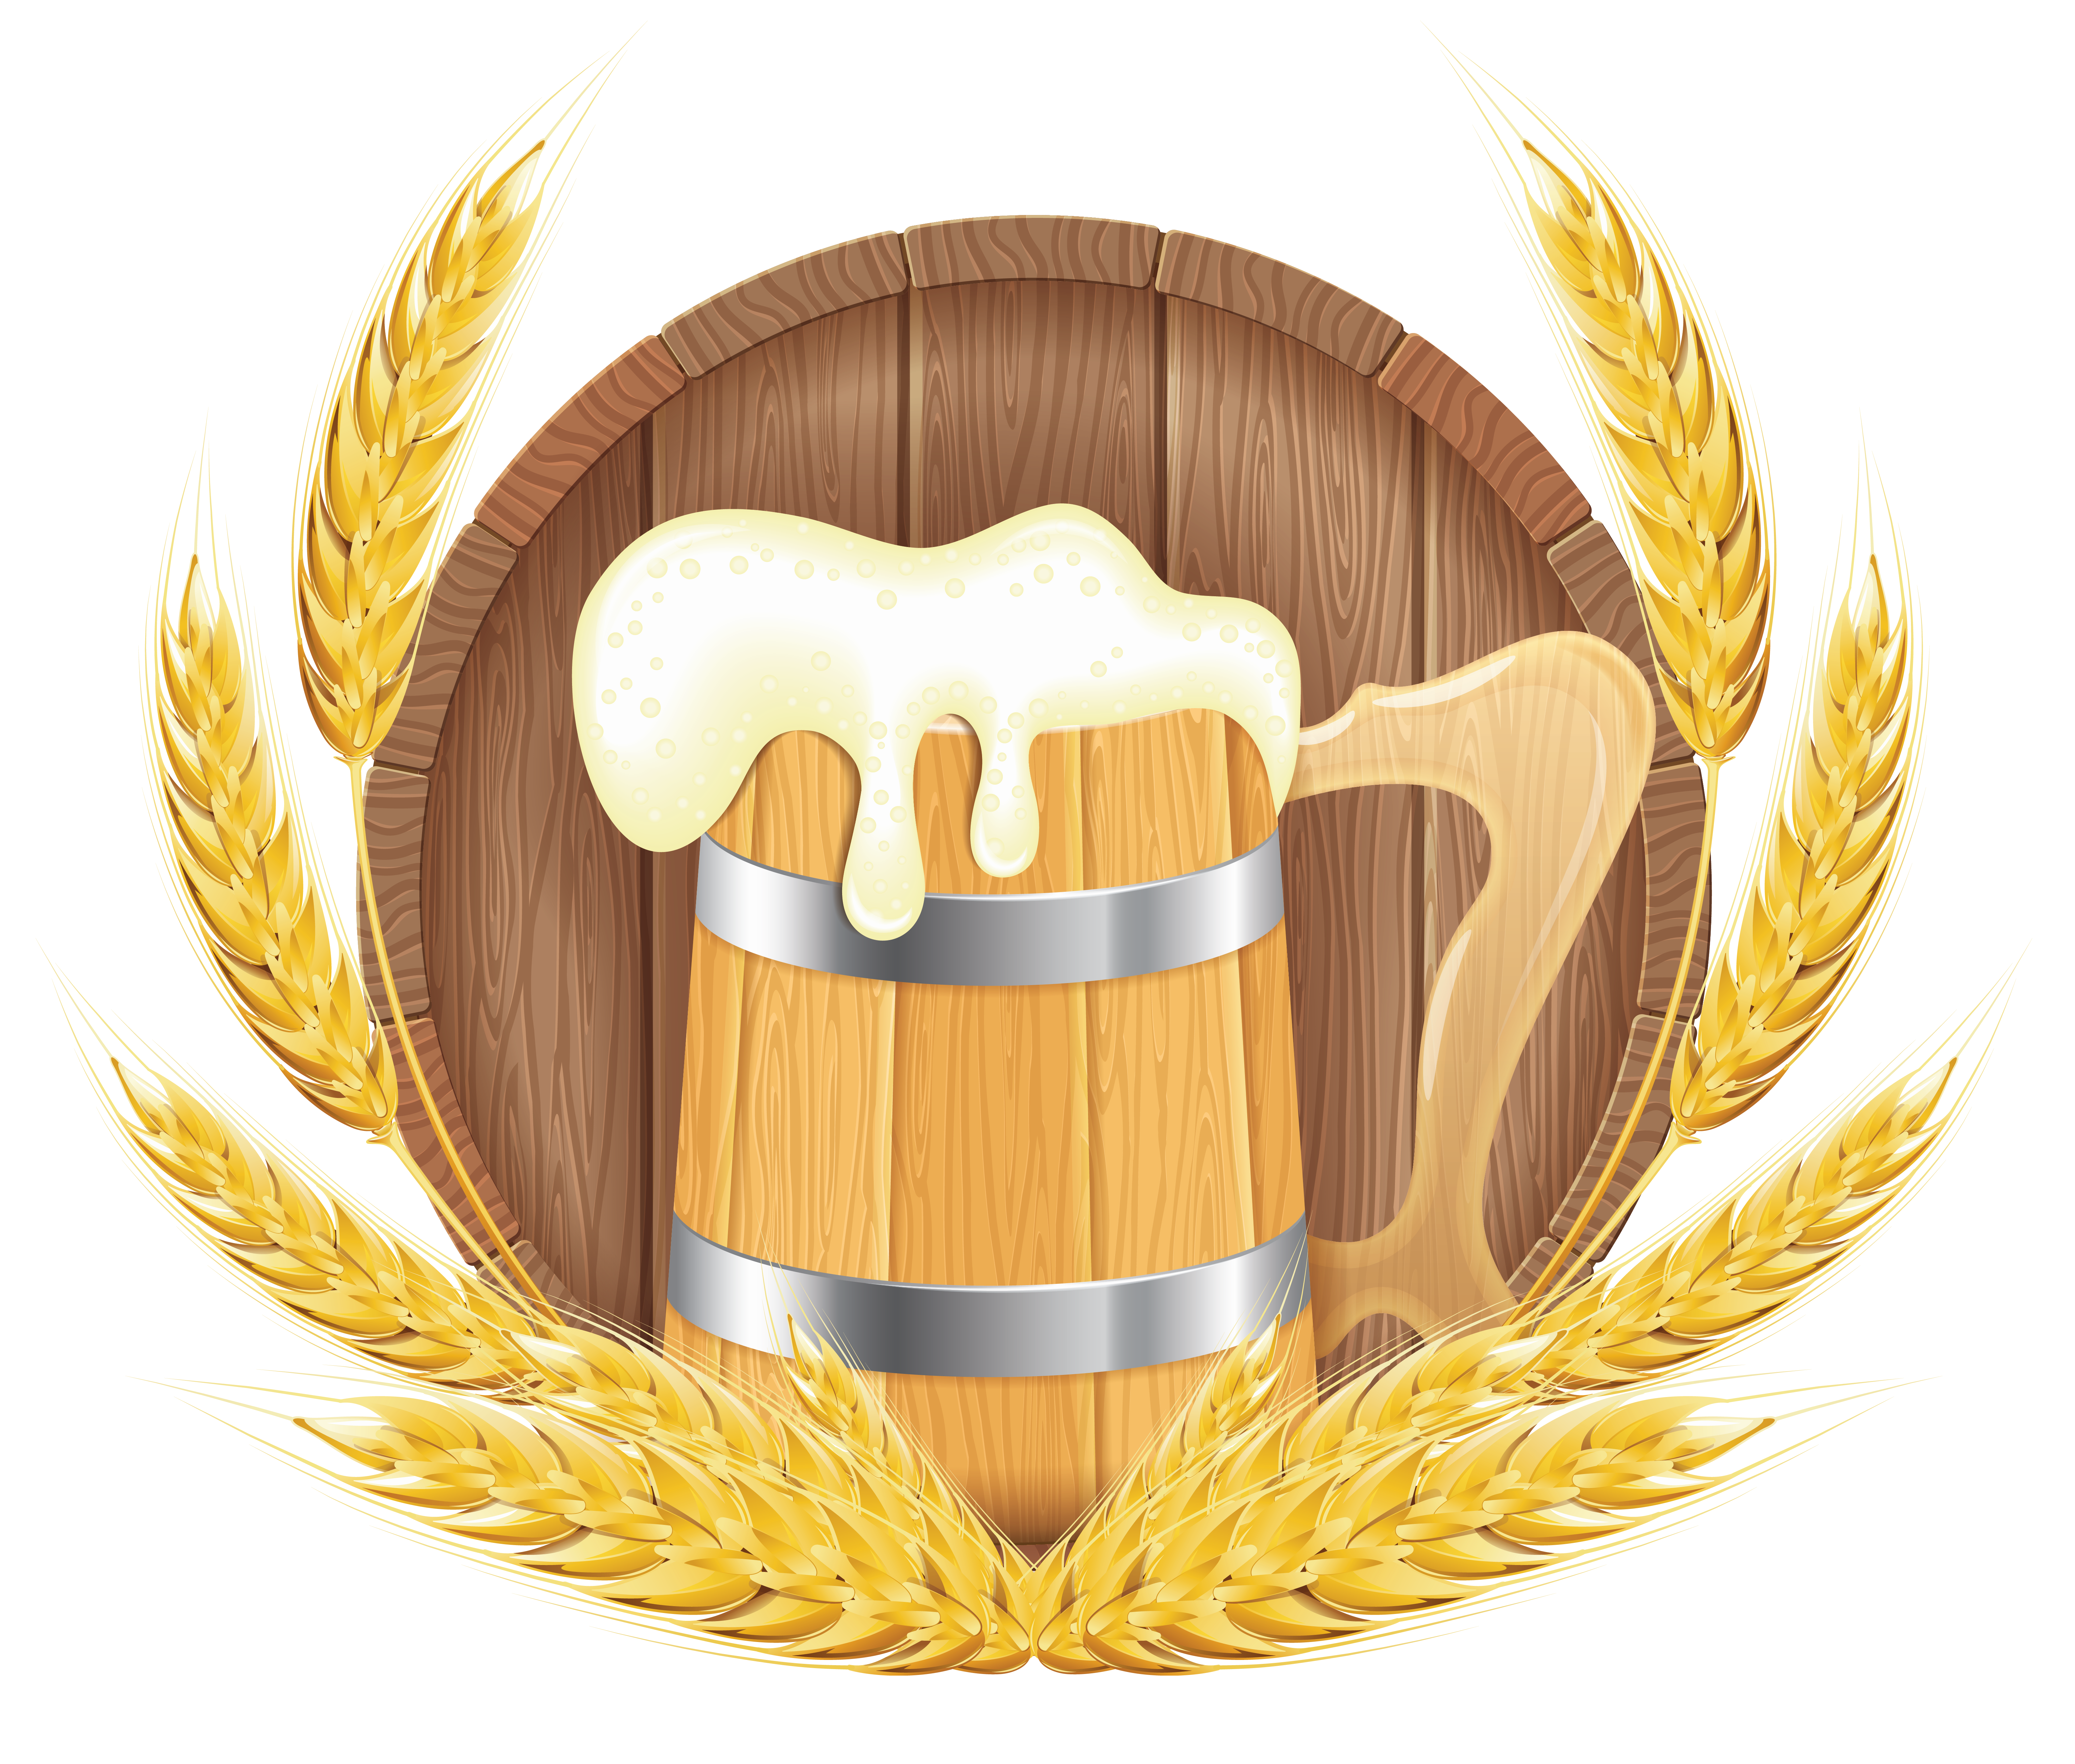 Oktoberfest barrel mug and. Maid clipart beer